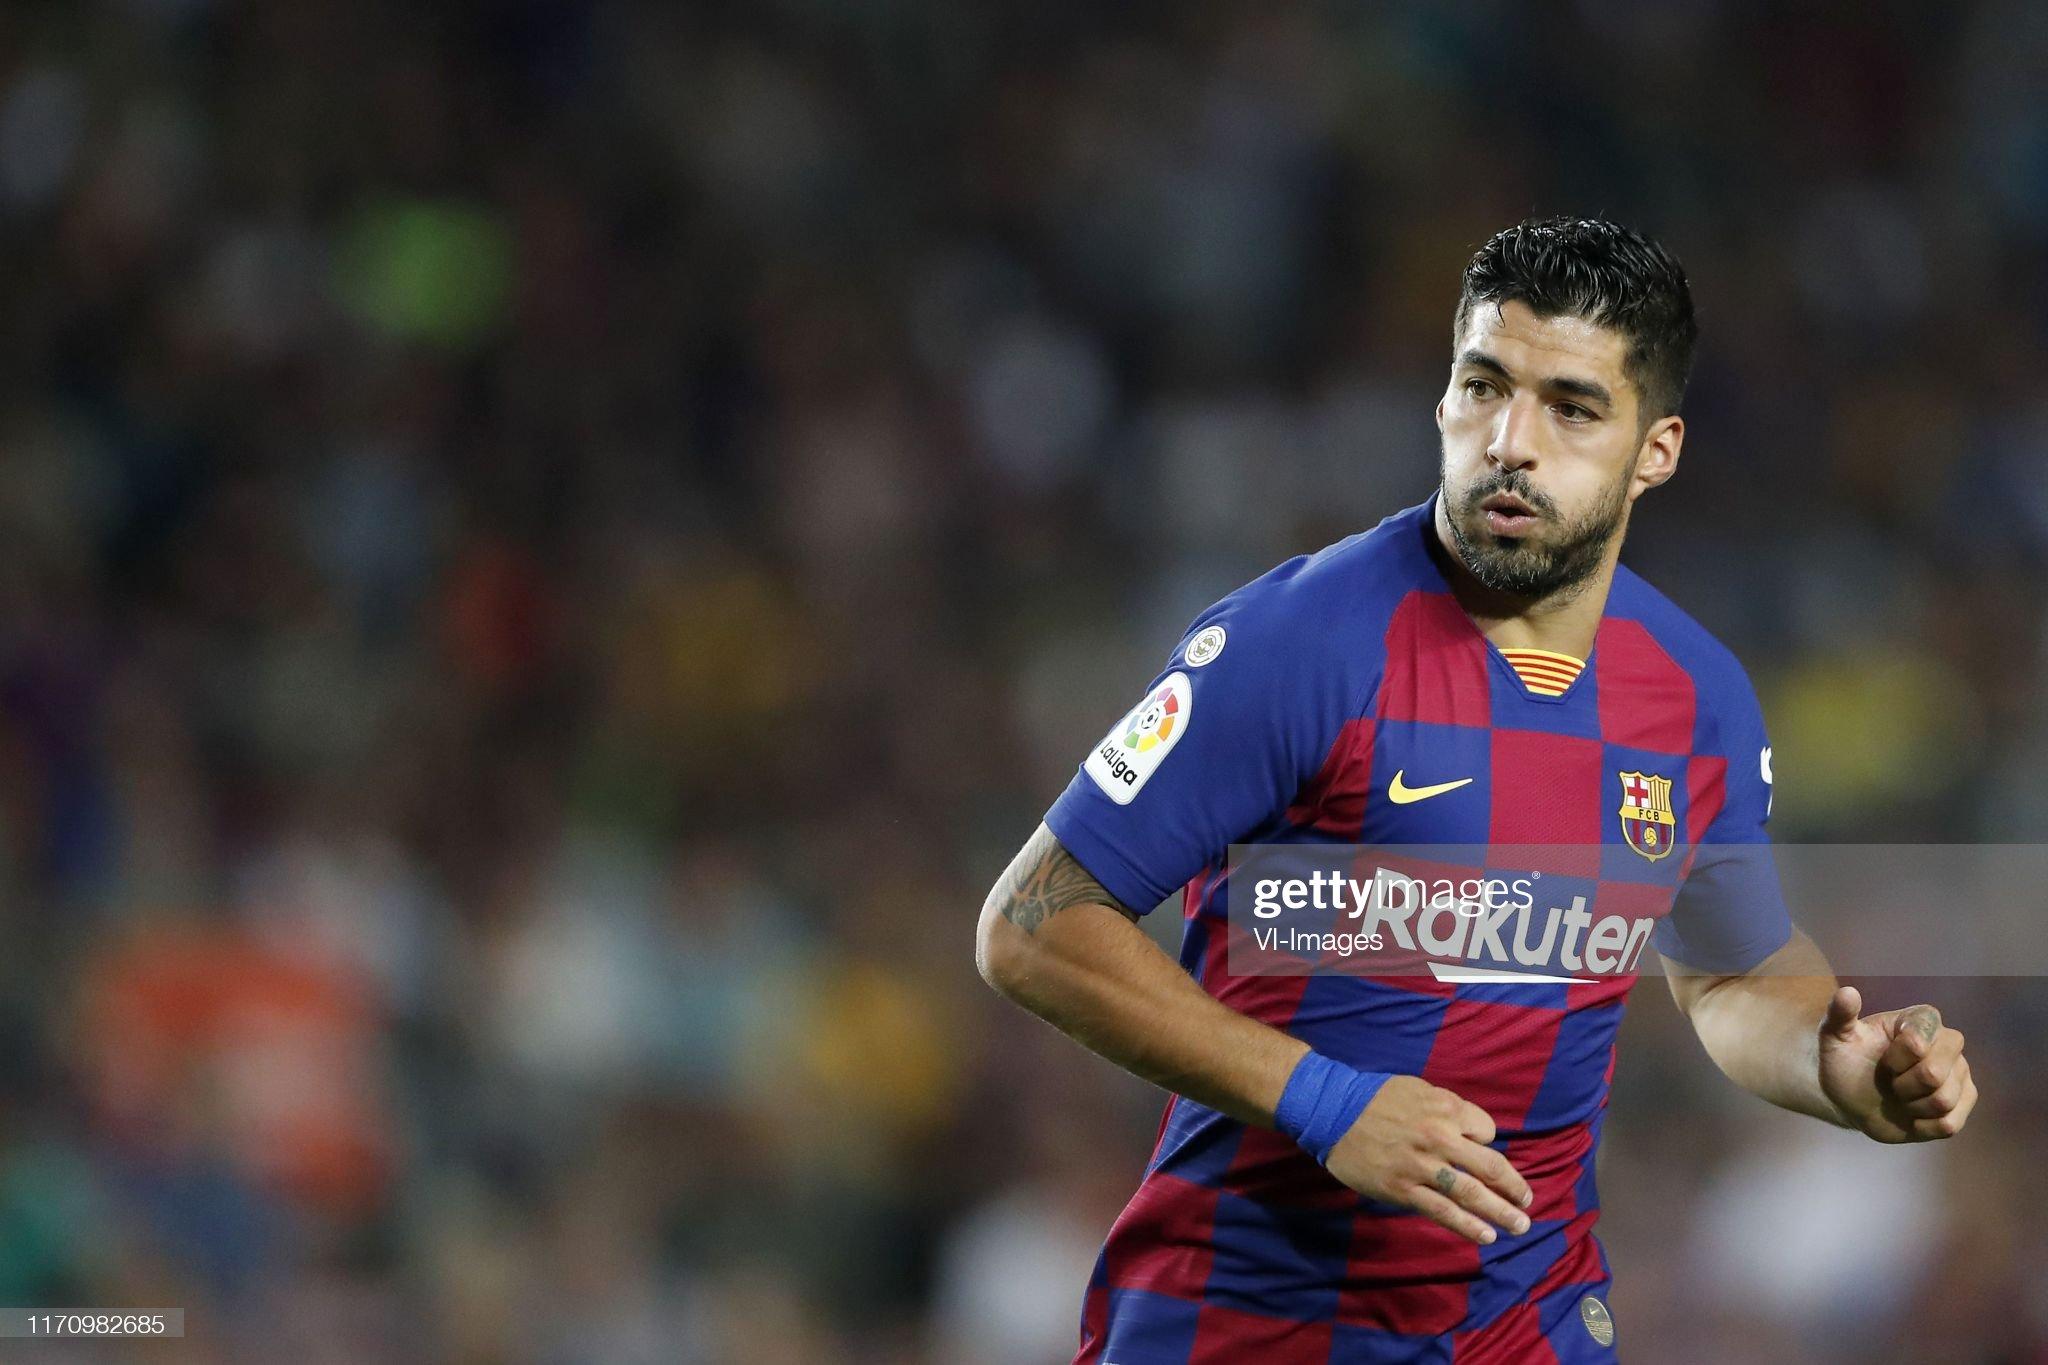 صور مباراة : برشلونة - فياريال 2-1 ( 24-09-2019 )  Luis-suarez-of-fc-barcelona-during-the-laliga-santander-match-between-picture-id1170982685?s=2048x2048